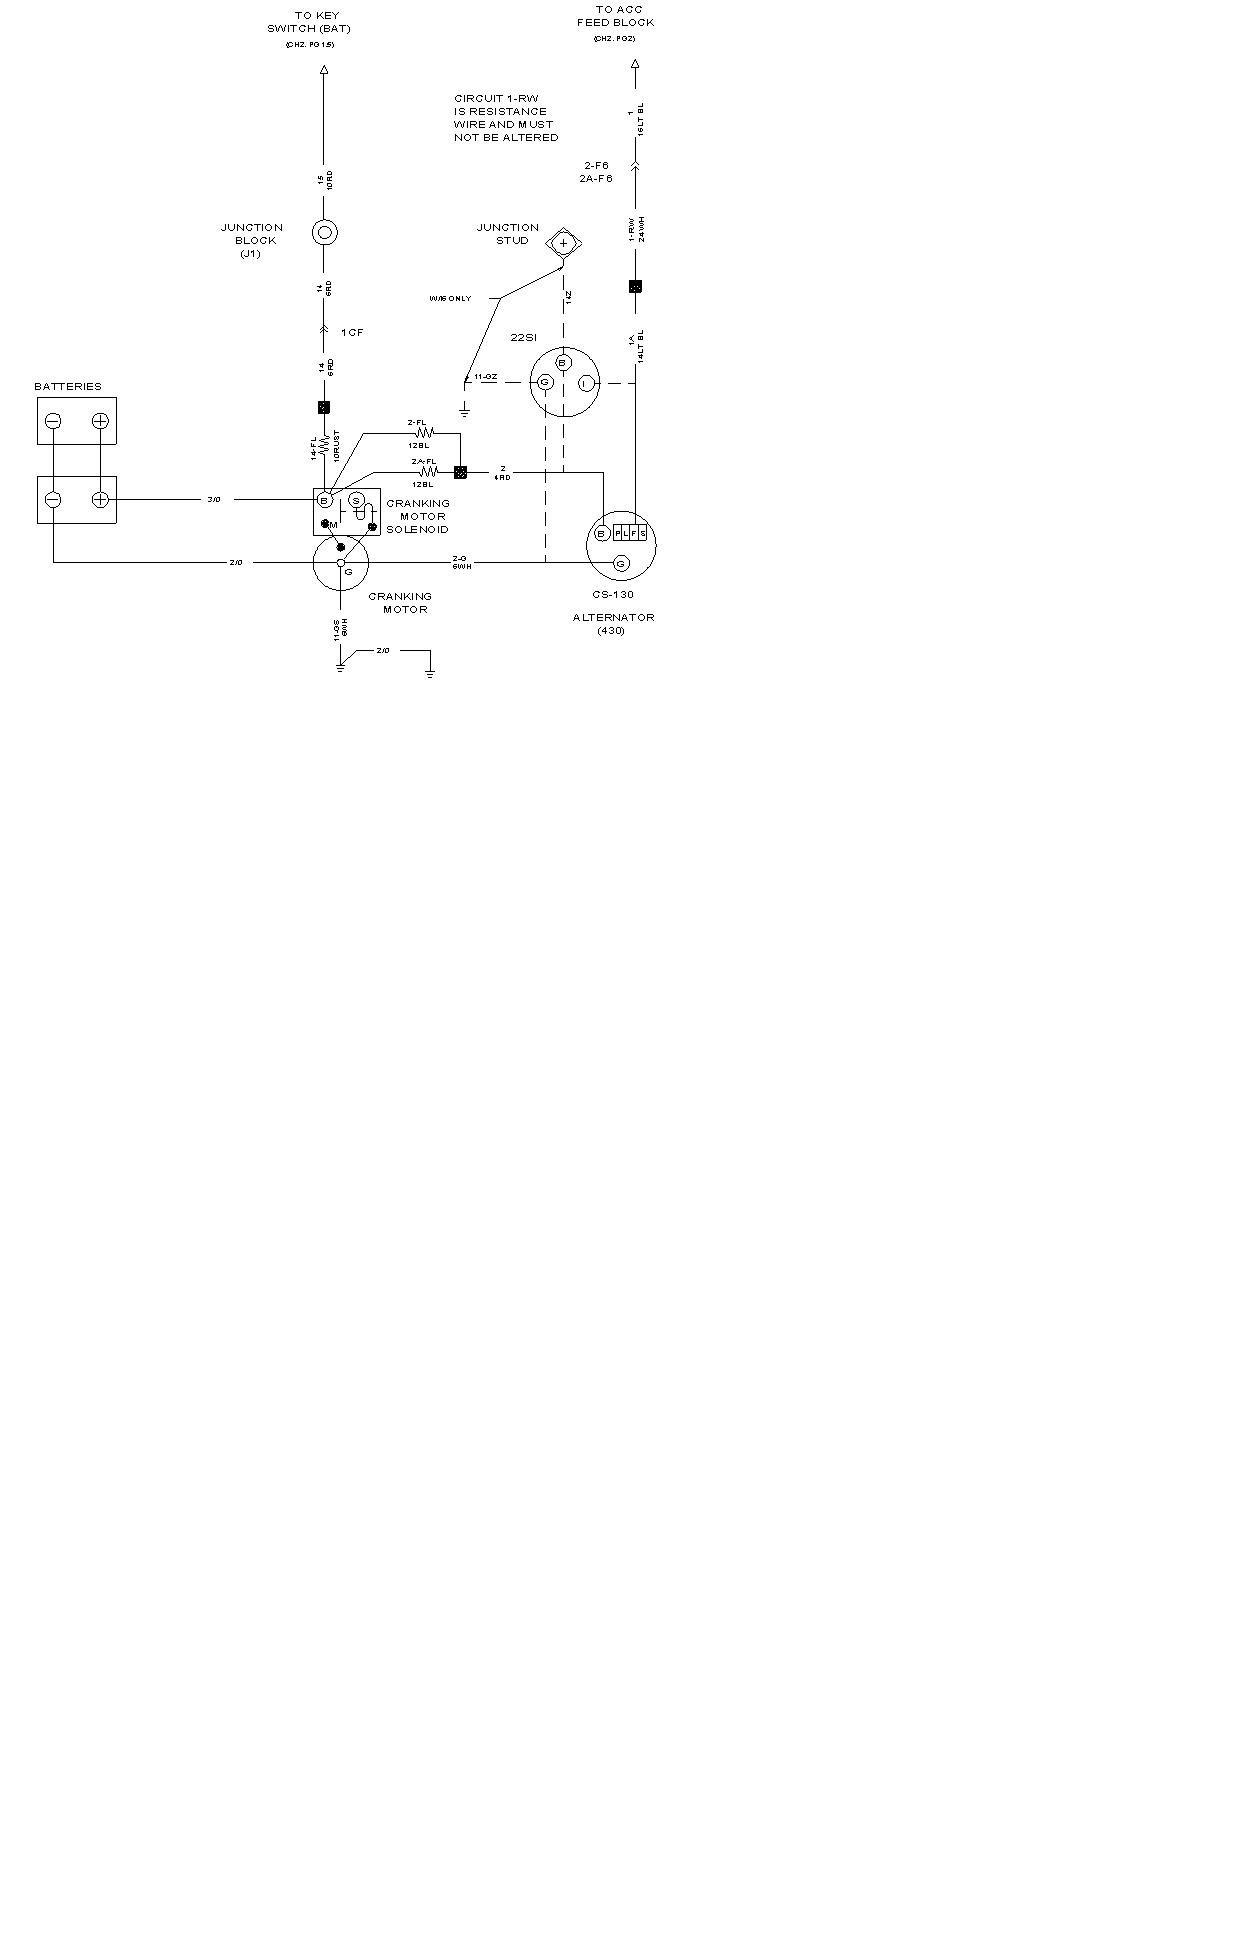 1999 international truck 4700 wiring diagram images 1990 bmy international truck wiring diagram 4900 international truck wiring